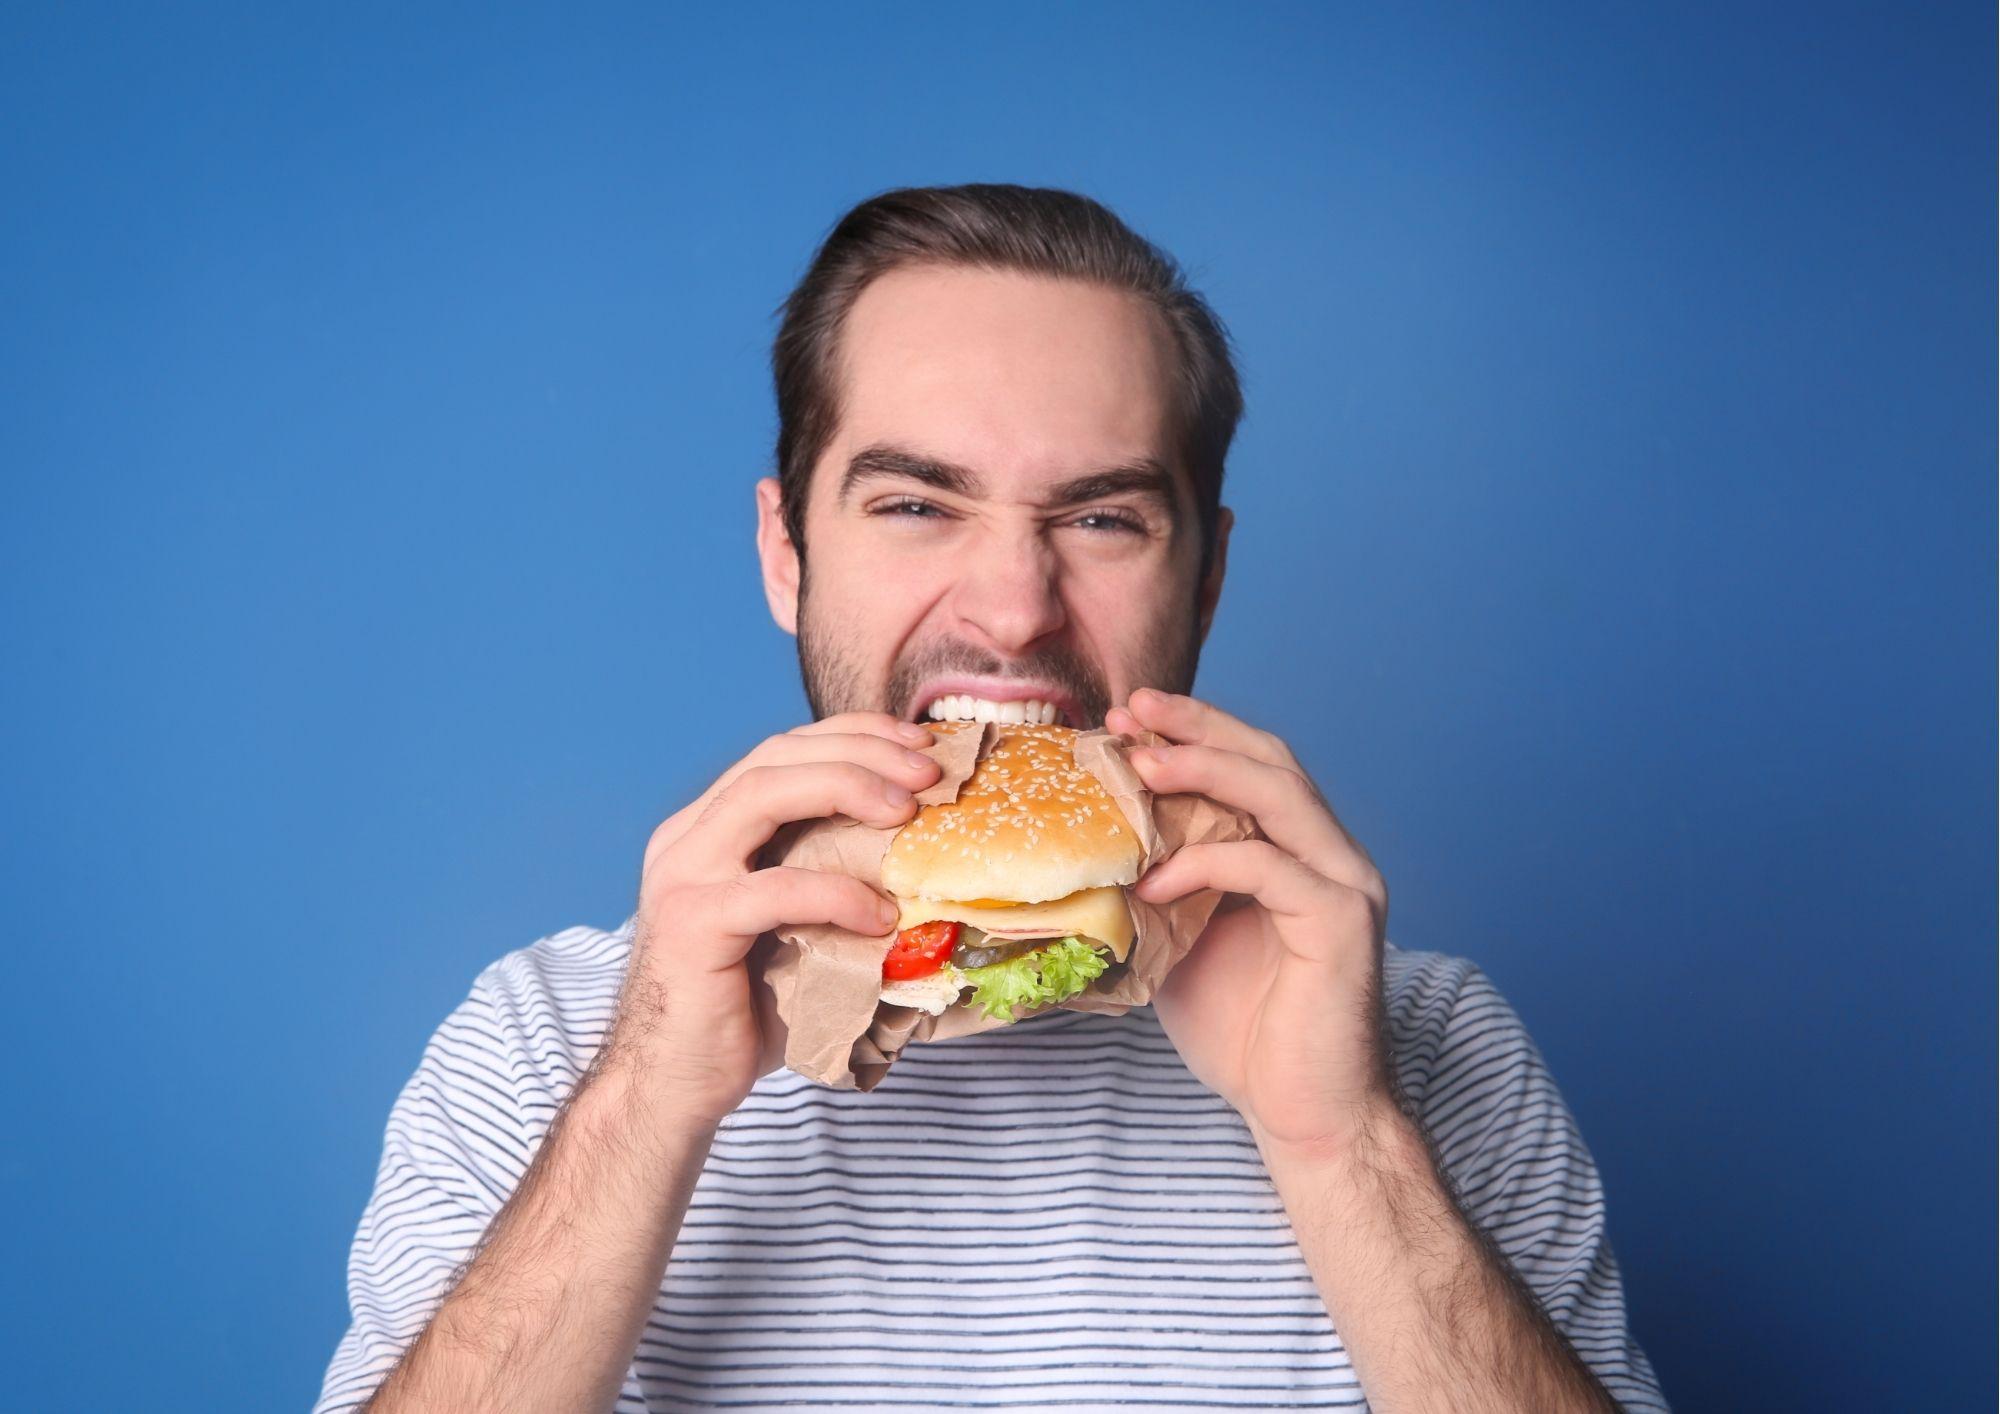 Eating yummy burger